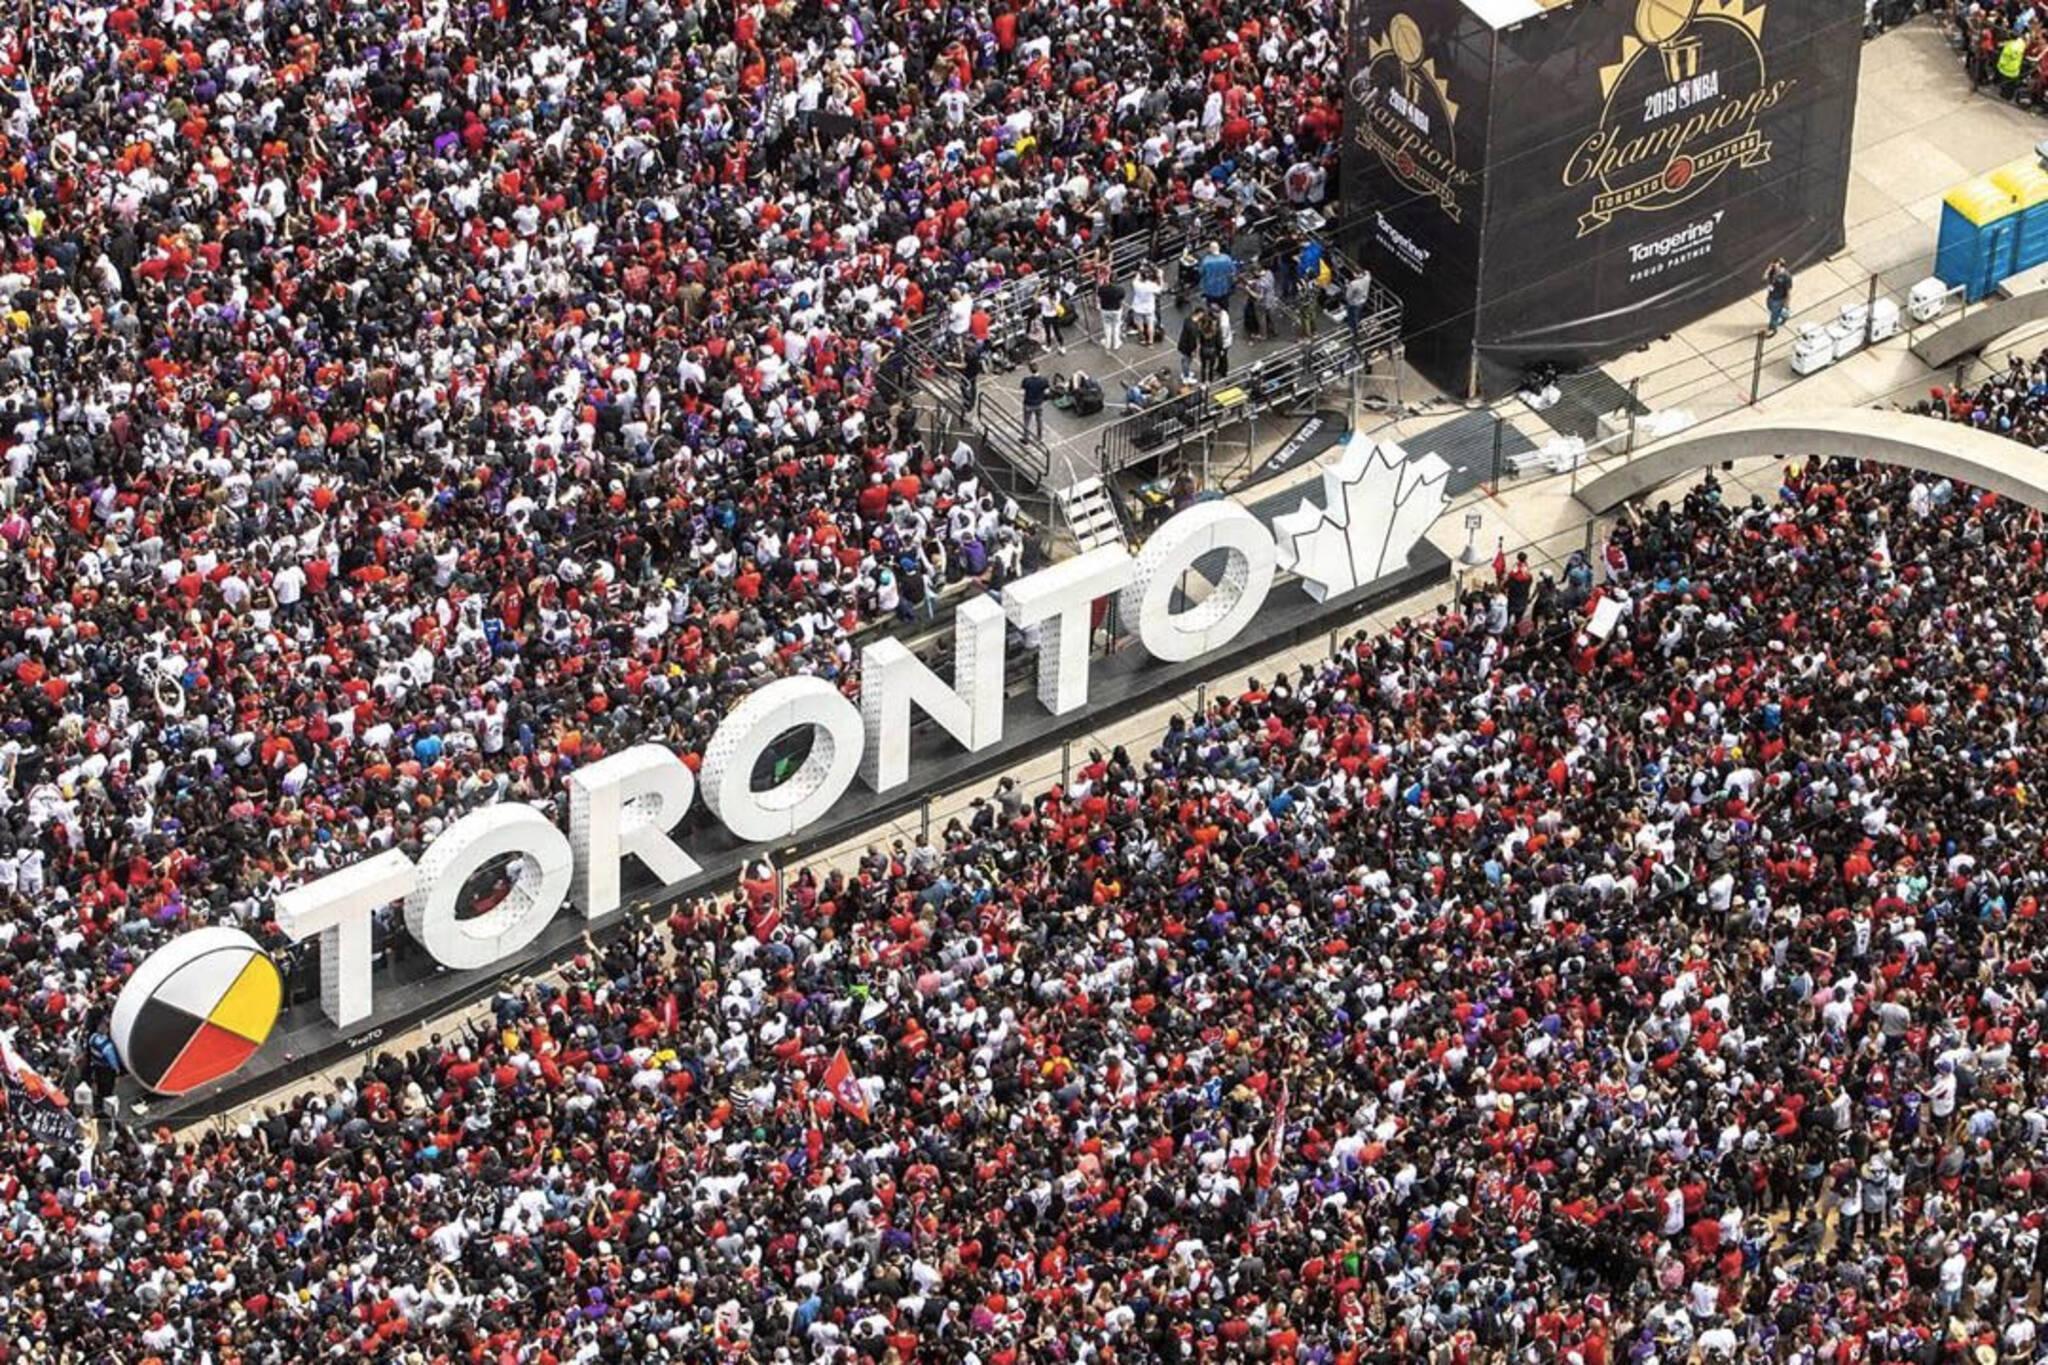 Toronto Raptors shooting